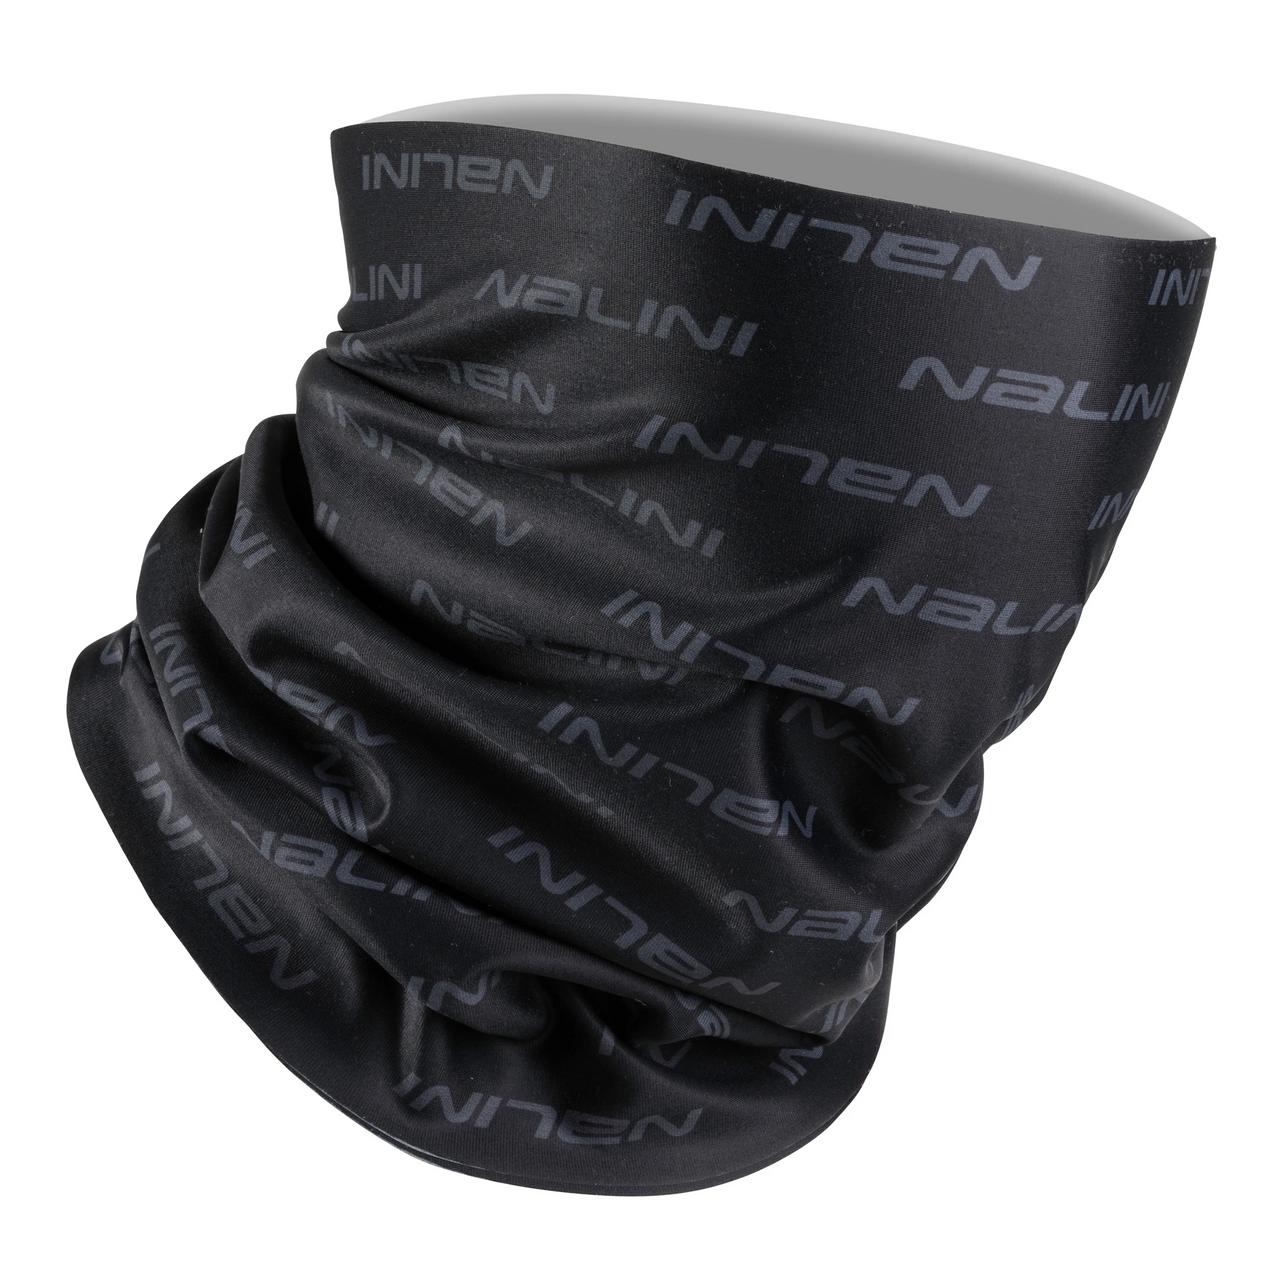 Nalini Collar 2.0 Black Neck Gaitor Tube